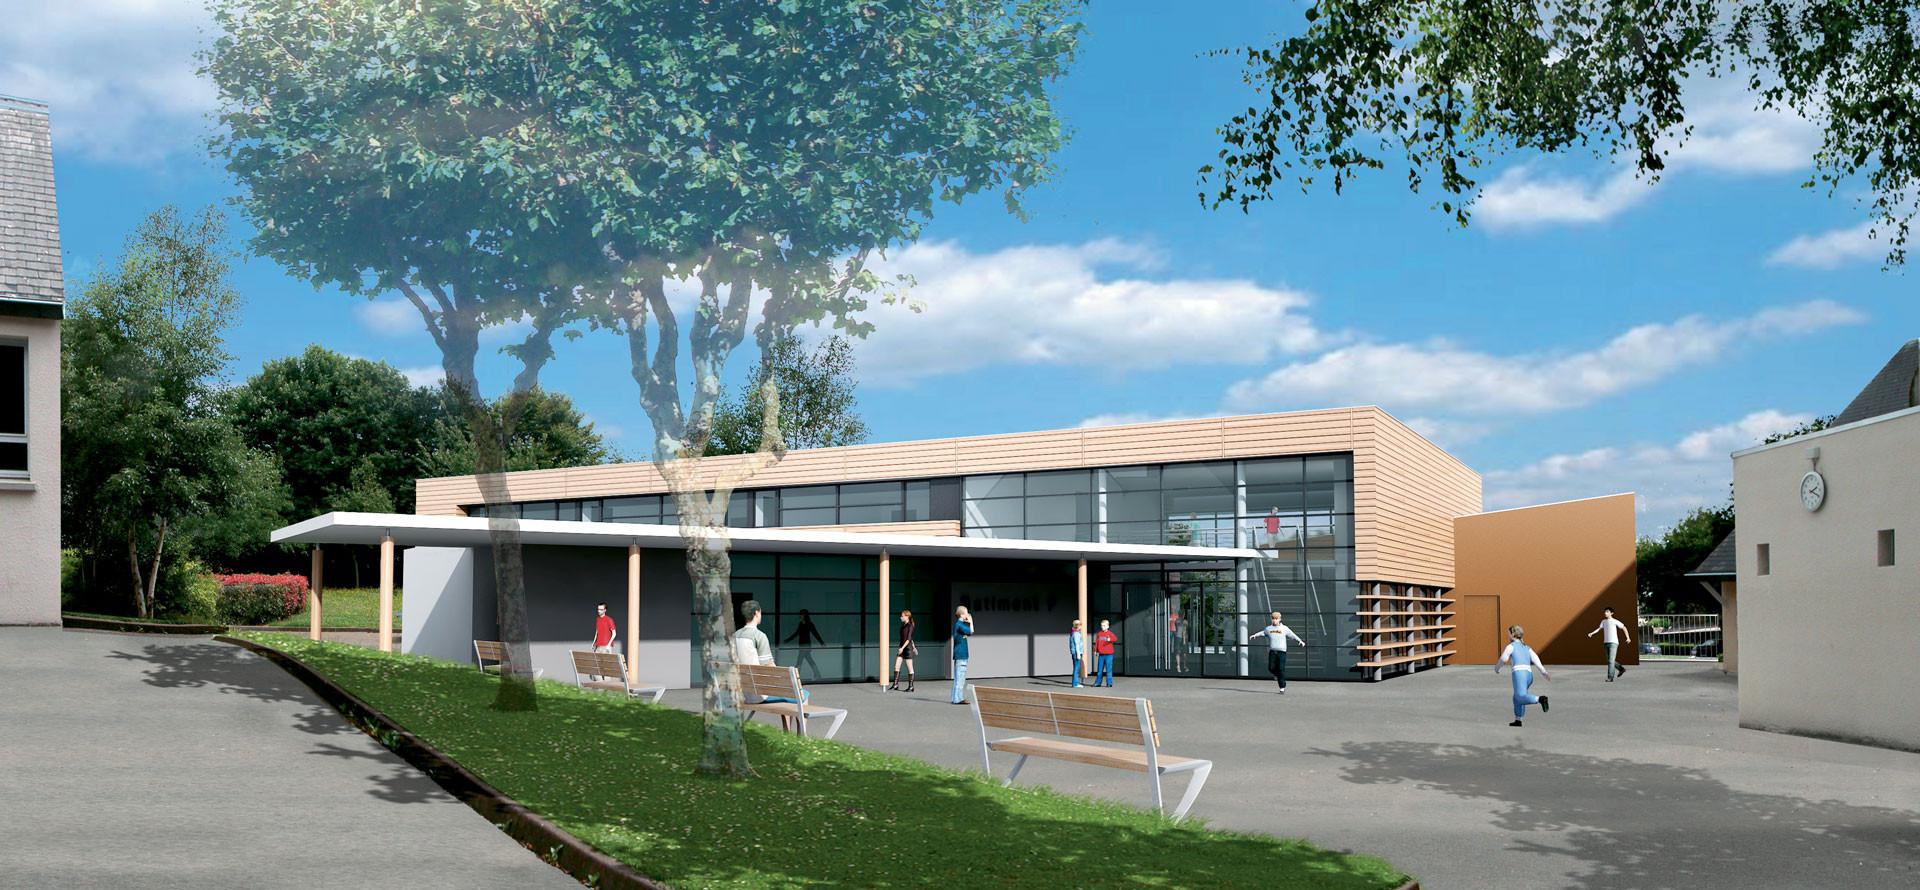 Collège - Briec de l'Odet